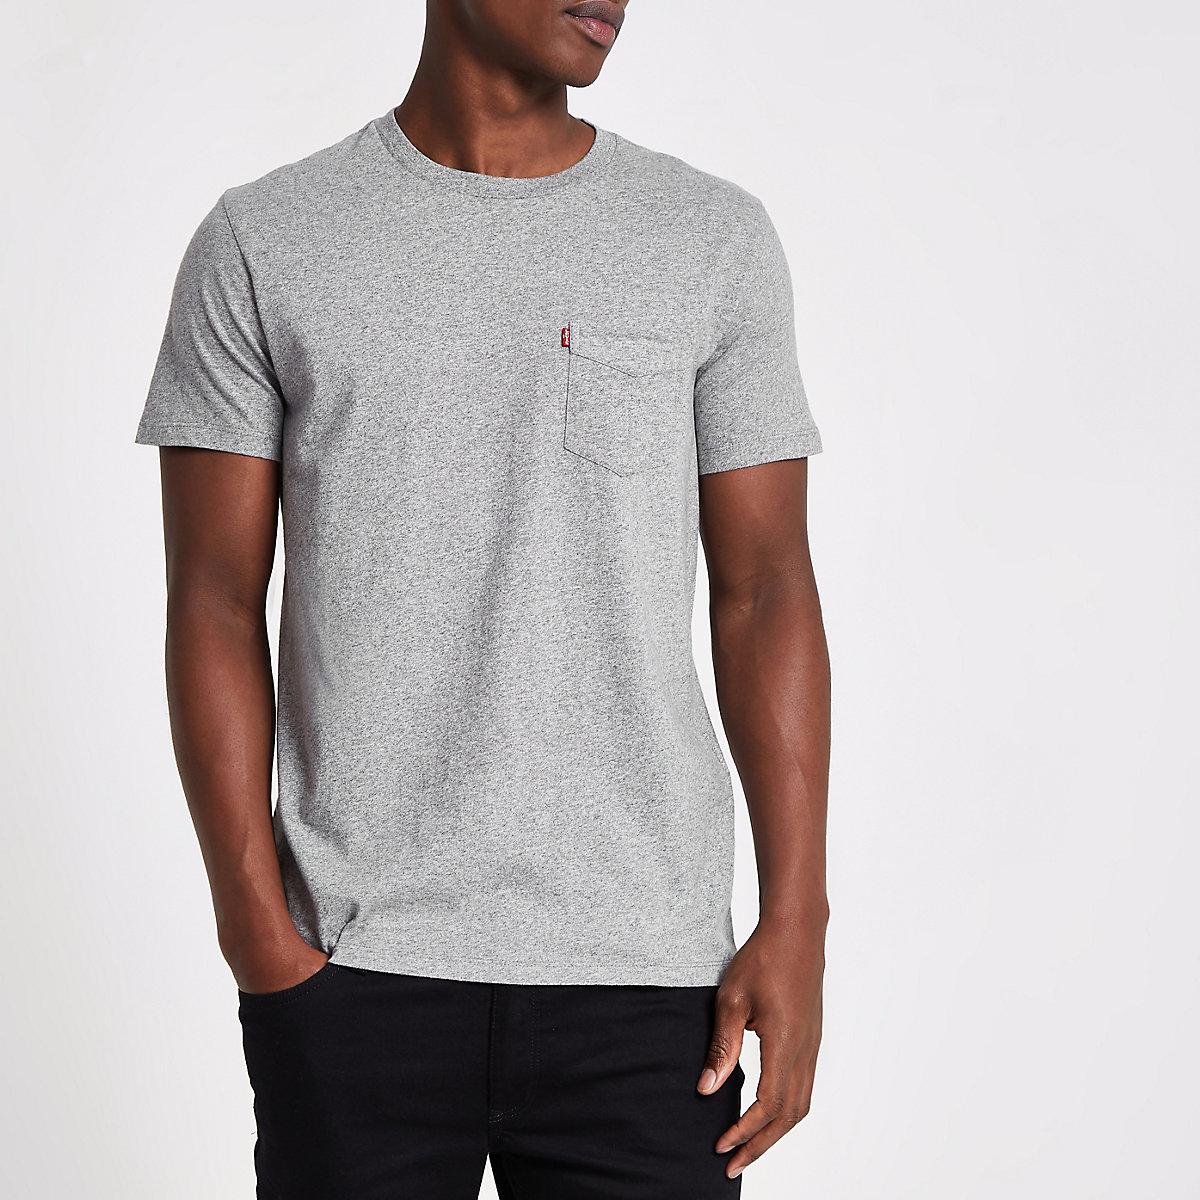 Levi's grey short sleeve pocket T-shirt